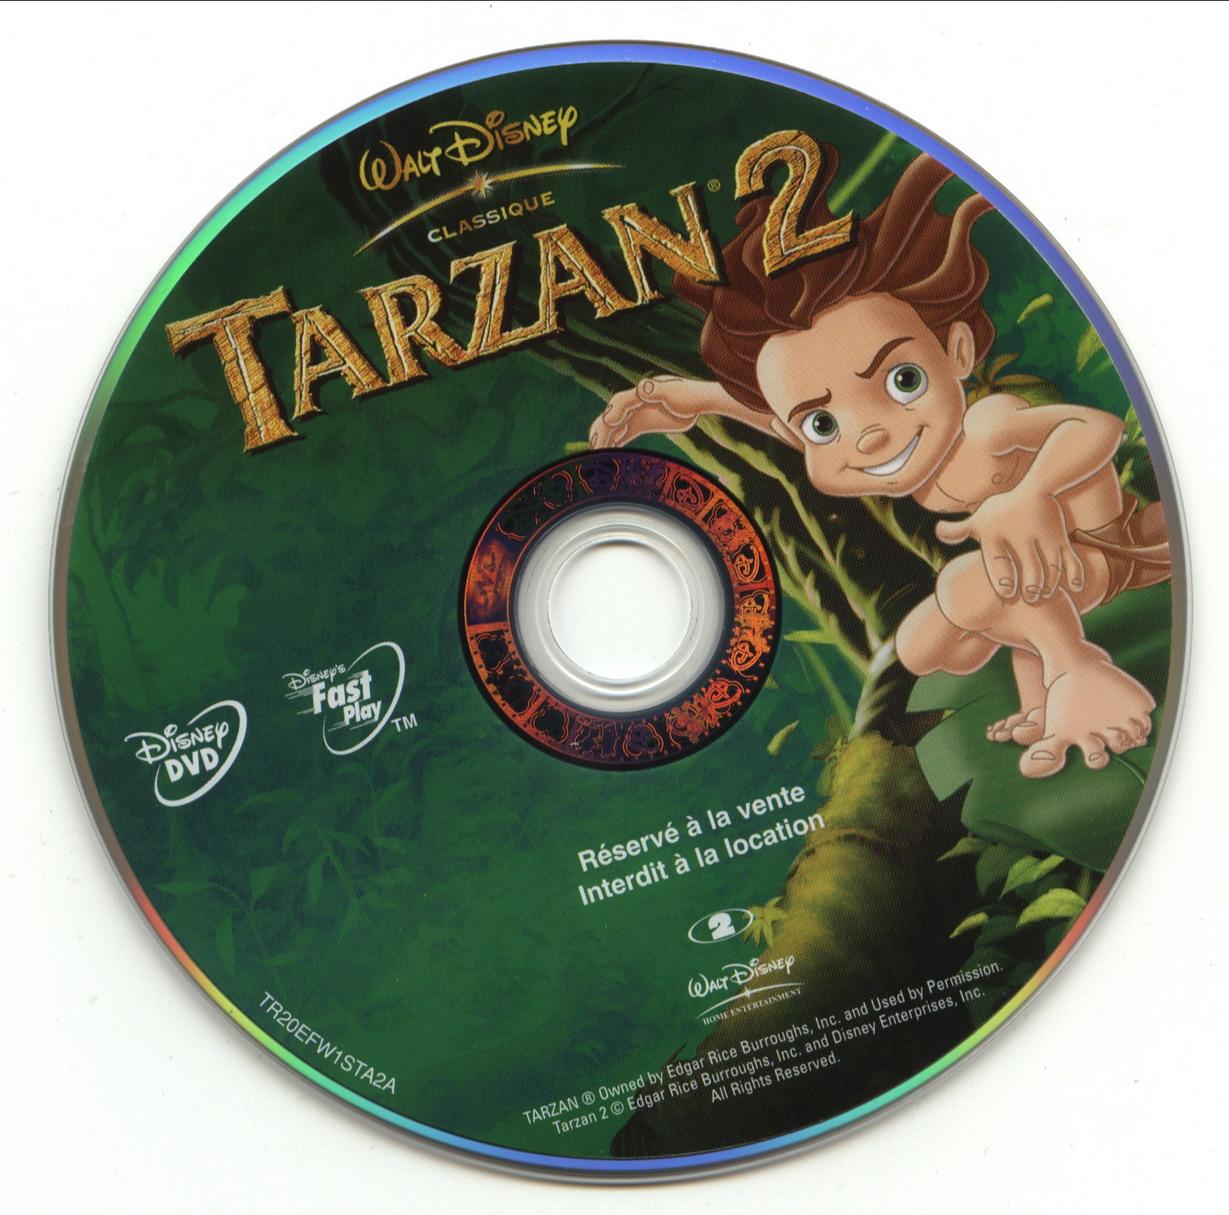 Tarzan 2 Dvd Tarzan 2 Dvd Source